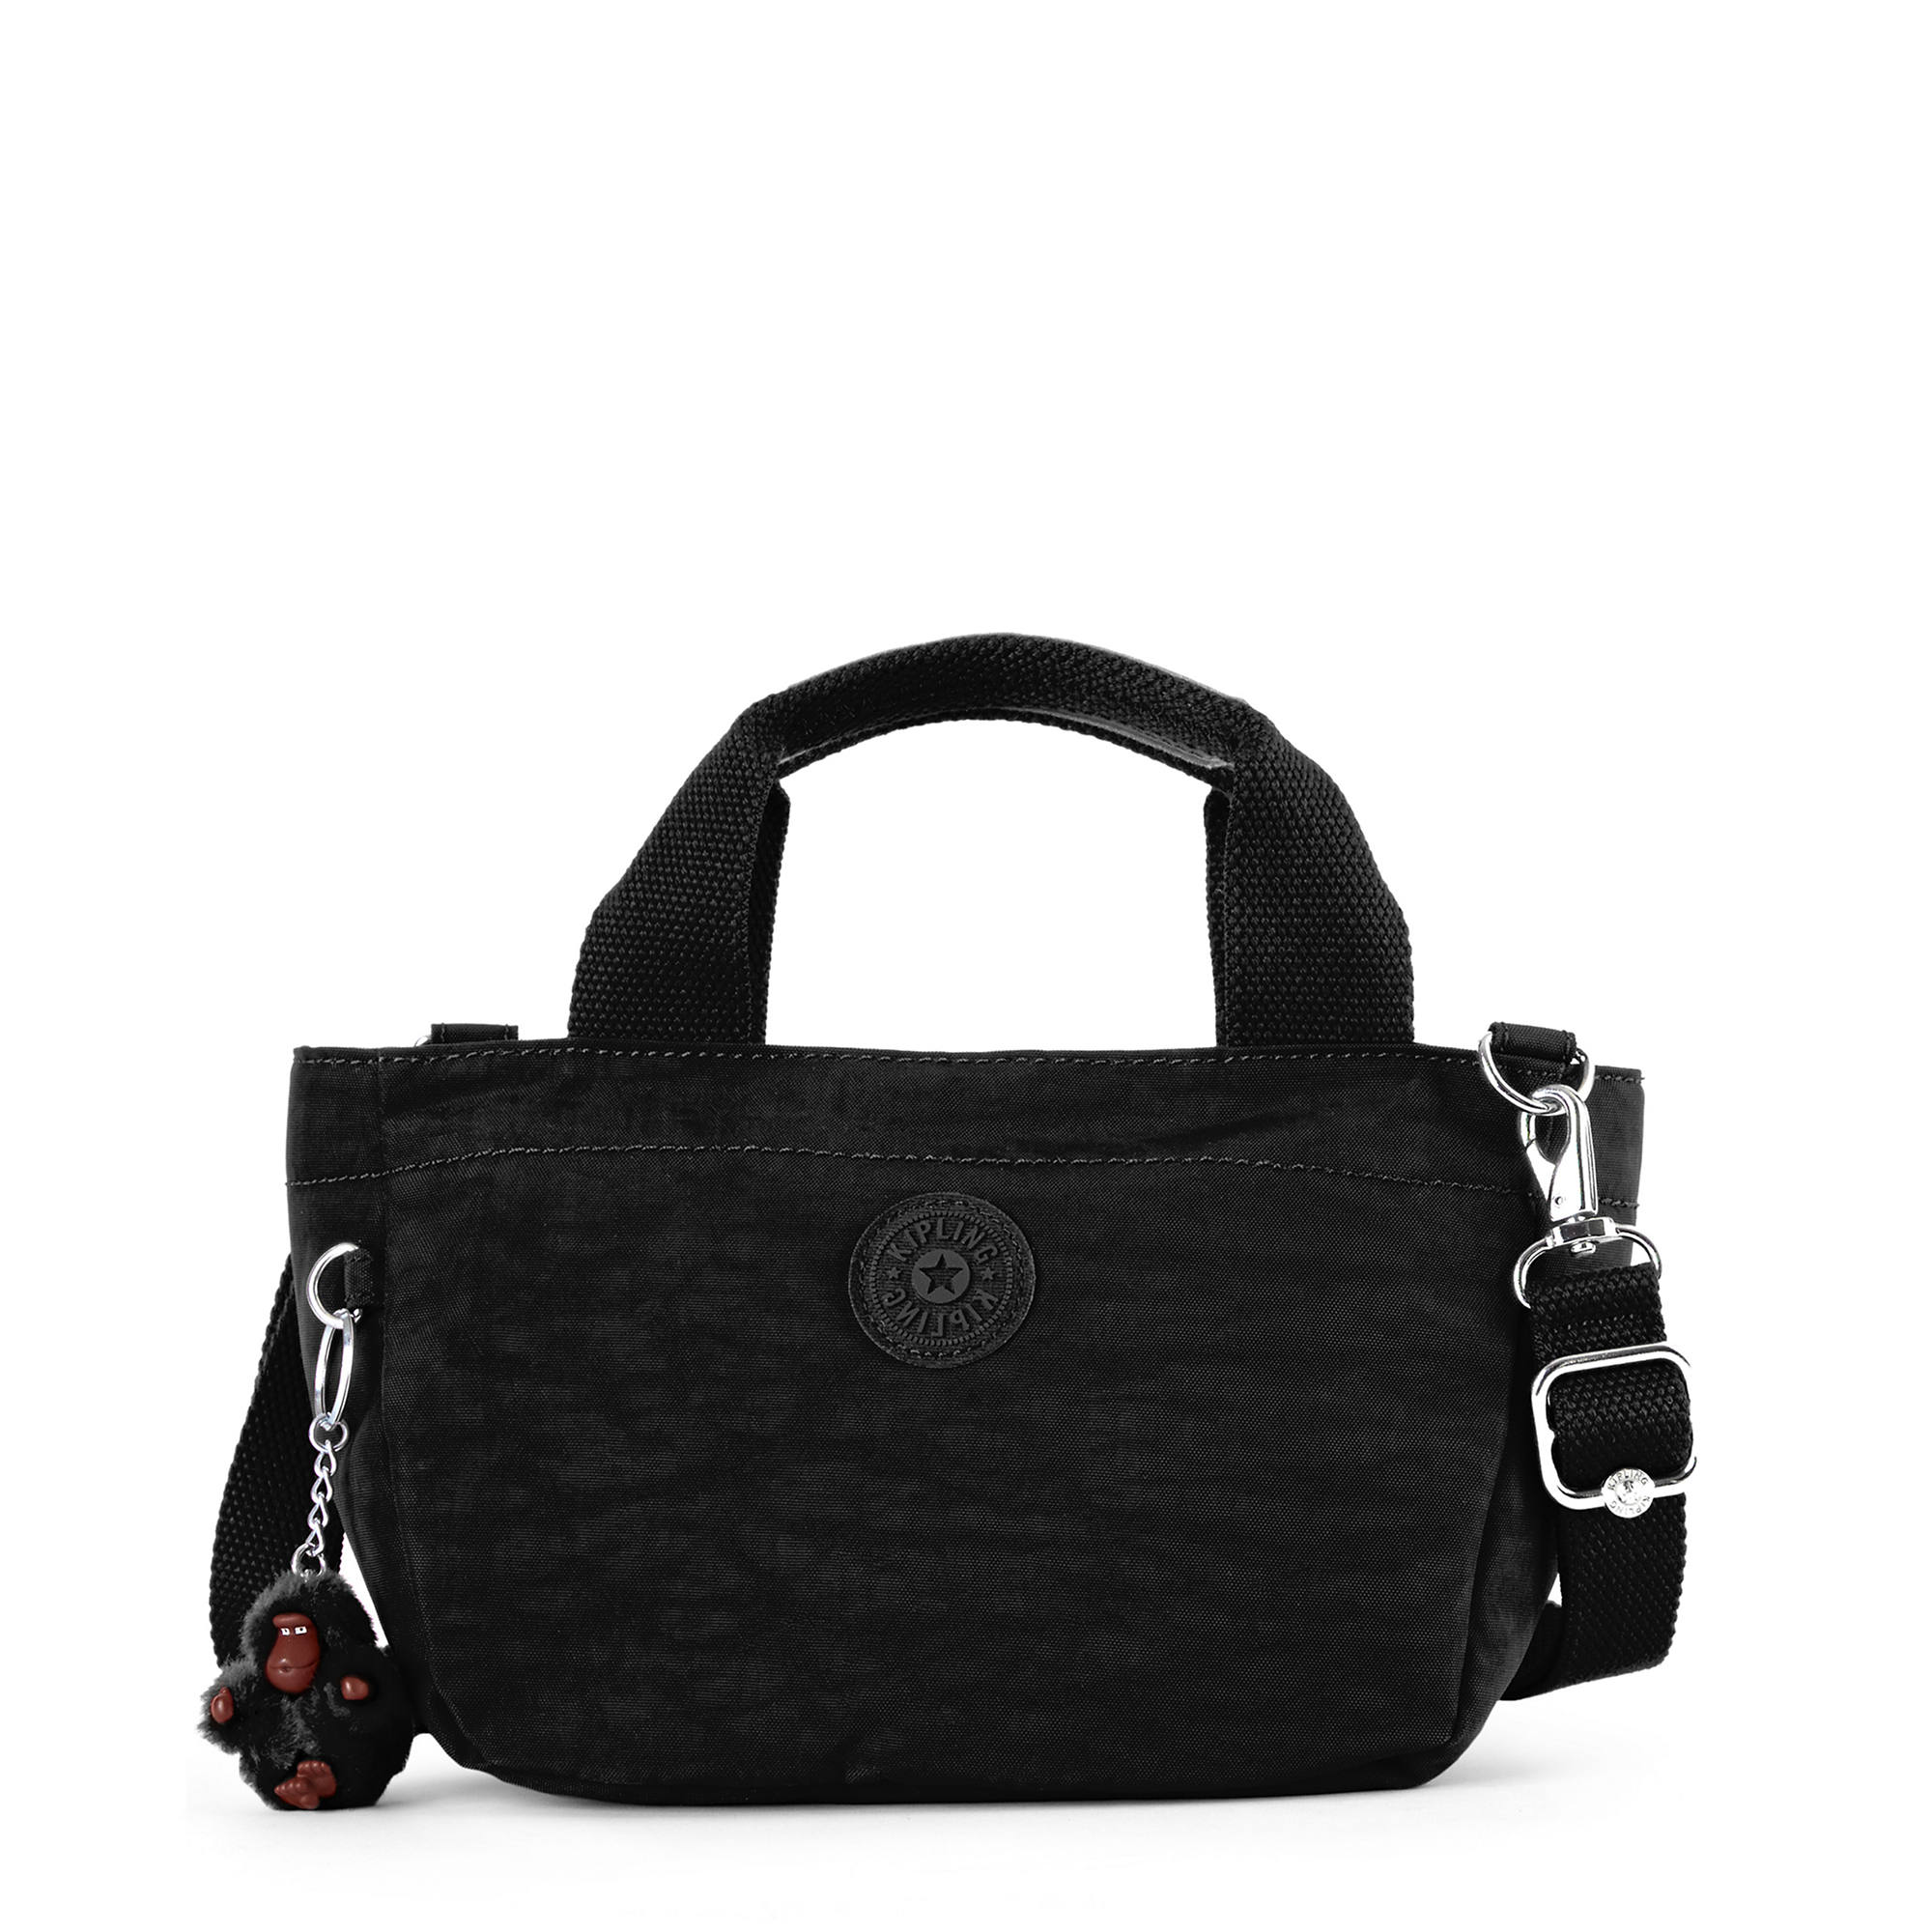 Sugar S Ii Mini Bag Black Large